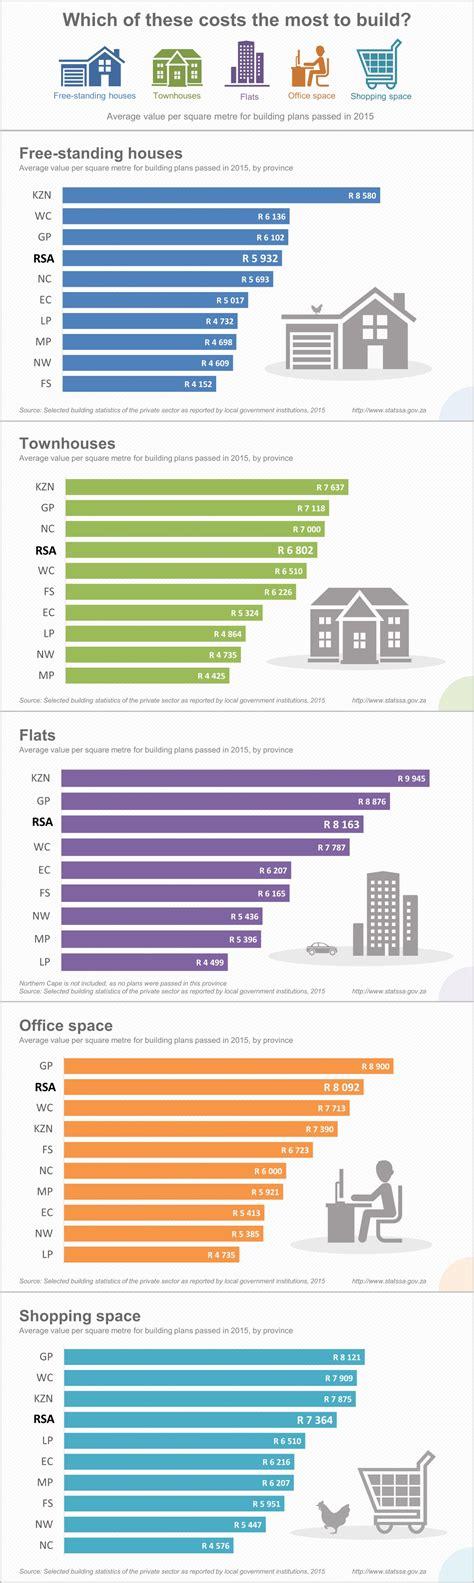 Nebenkosten Pro Quadratmeter by Building Costs Per Square Metre In South Africa